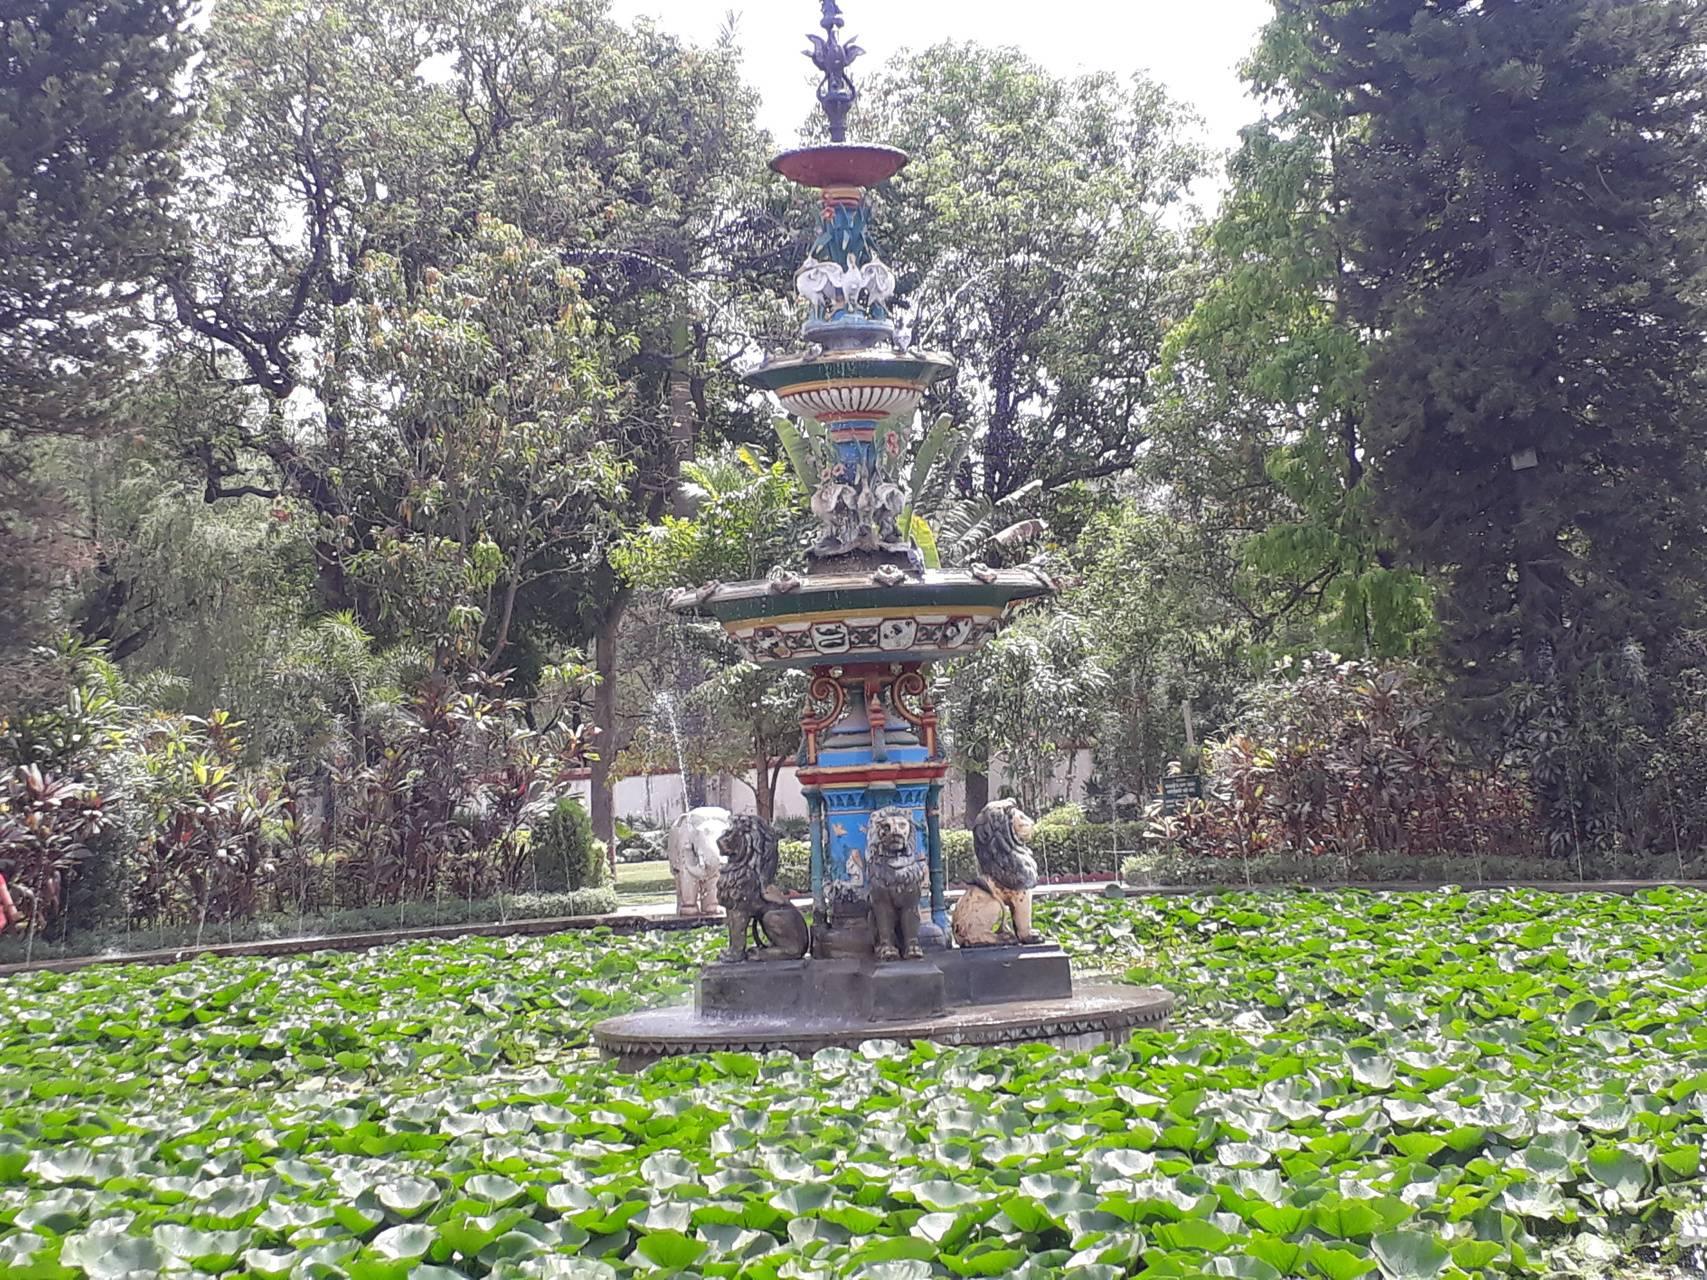 Sukhadia fountain